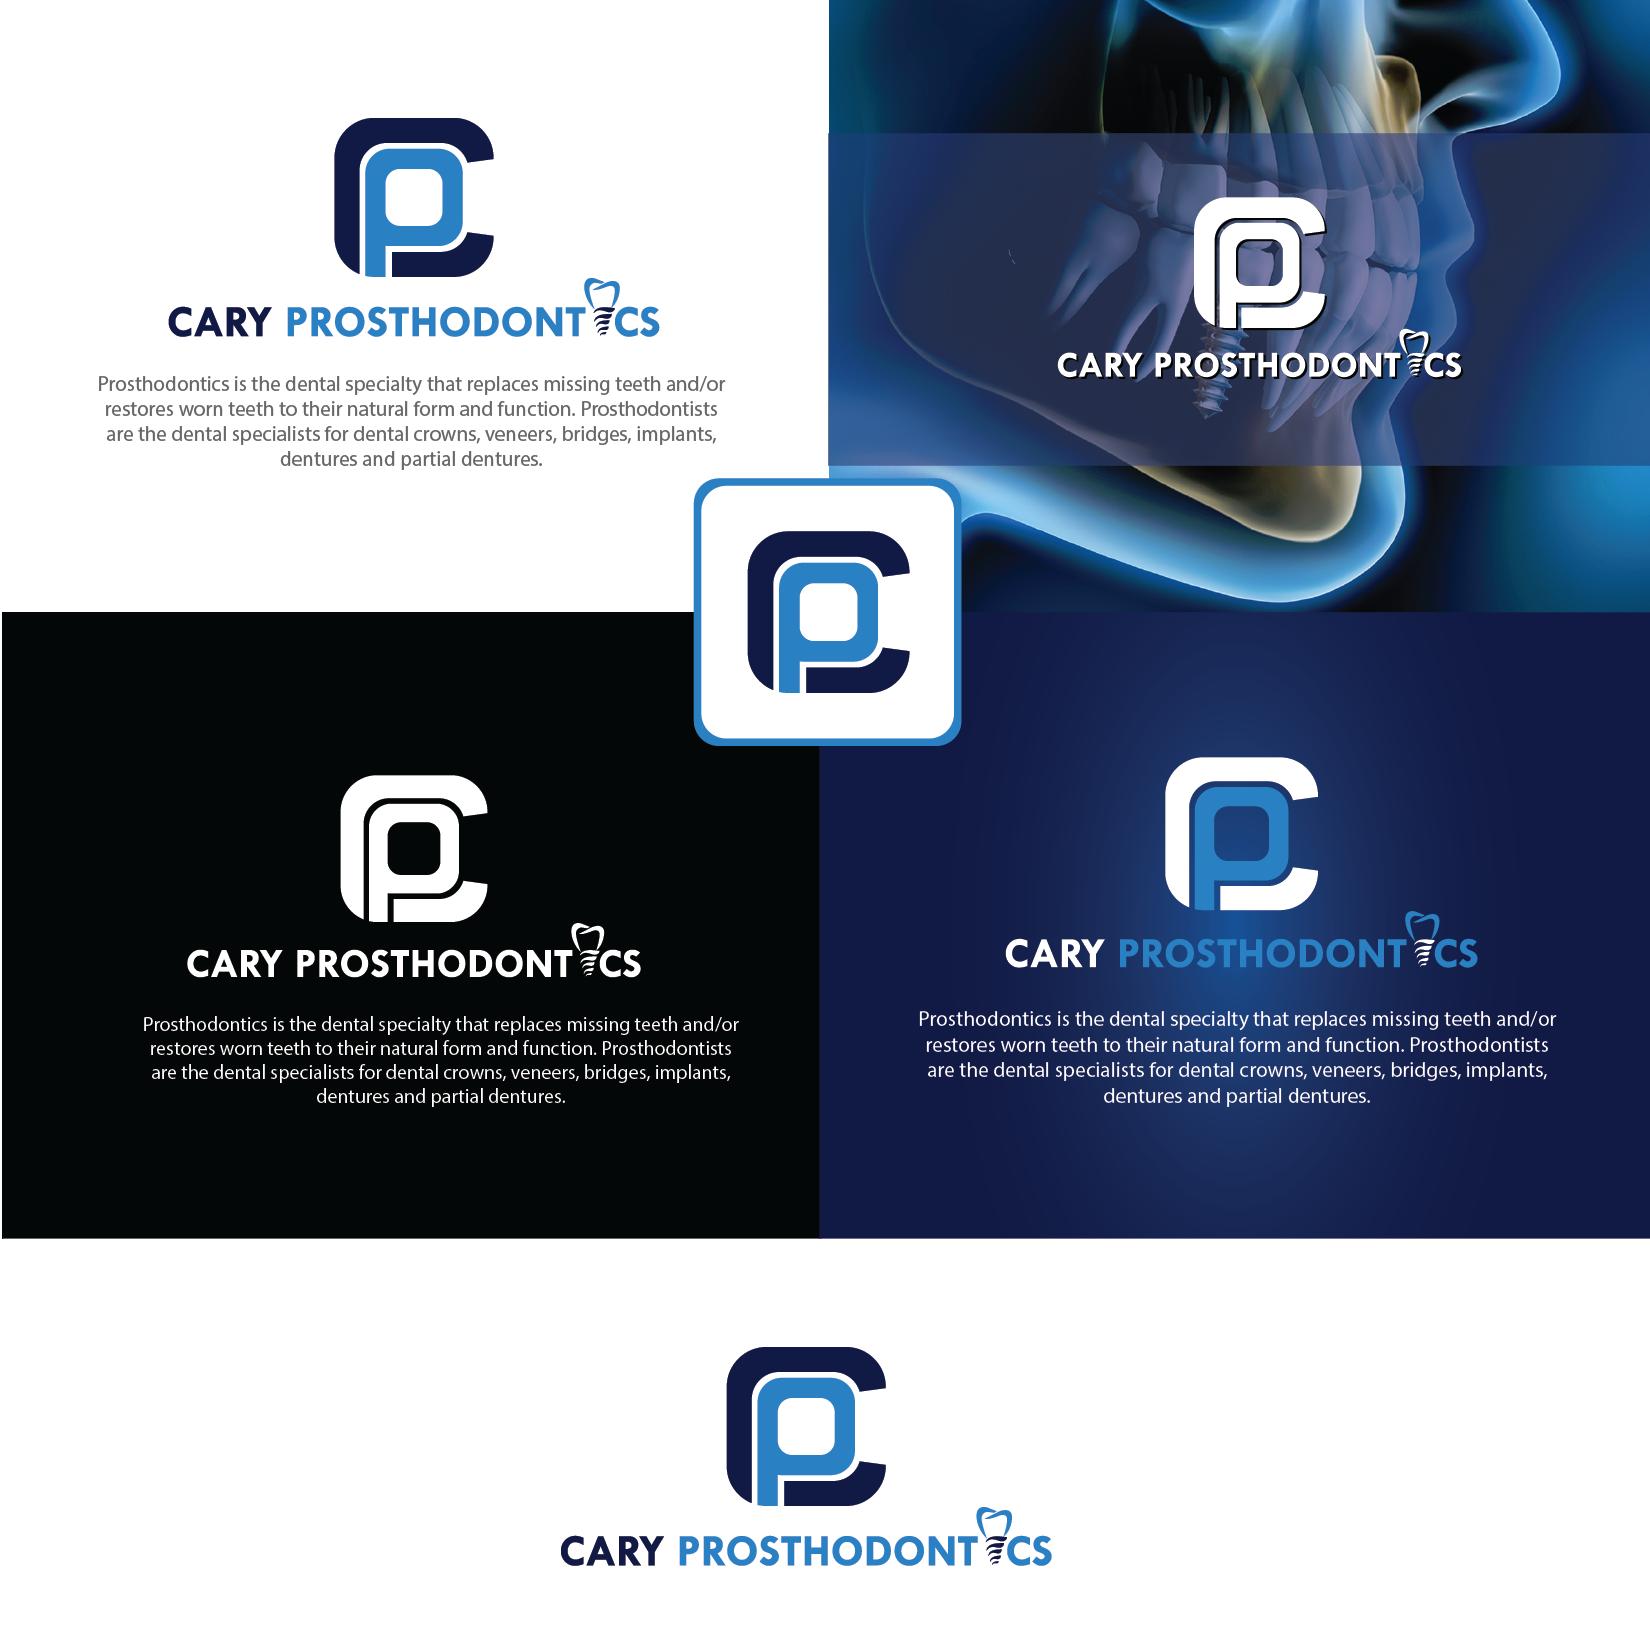 Logo Design by Private User - Entry No. 168 in the Logo Design Contest Cary Prosthodontics Logo Design.